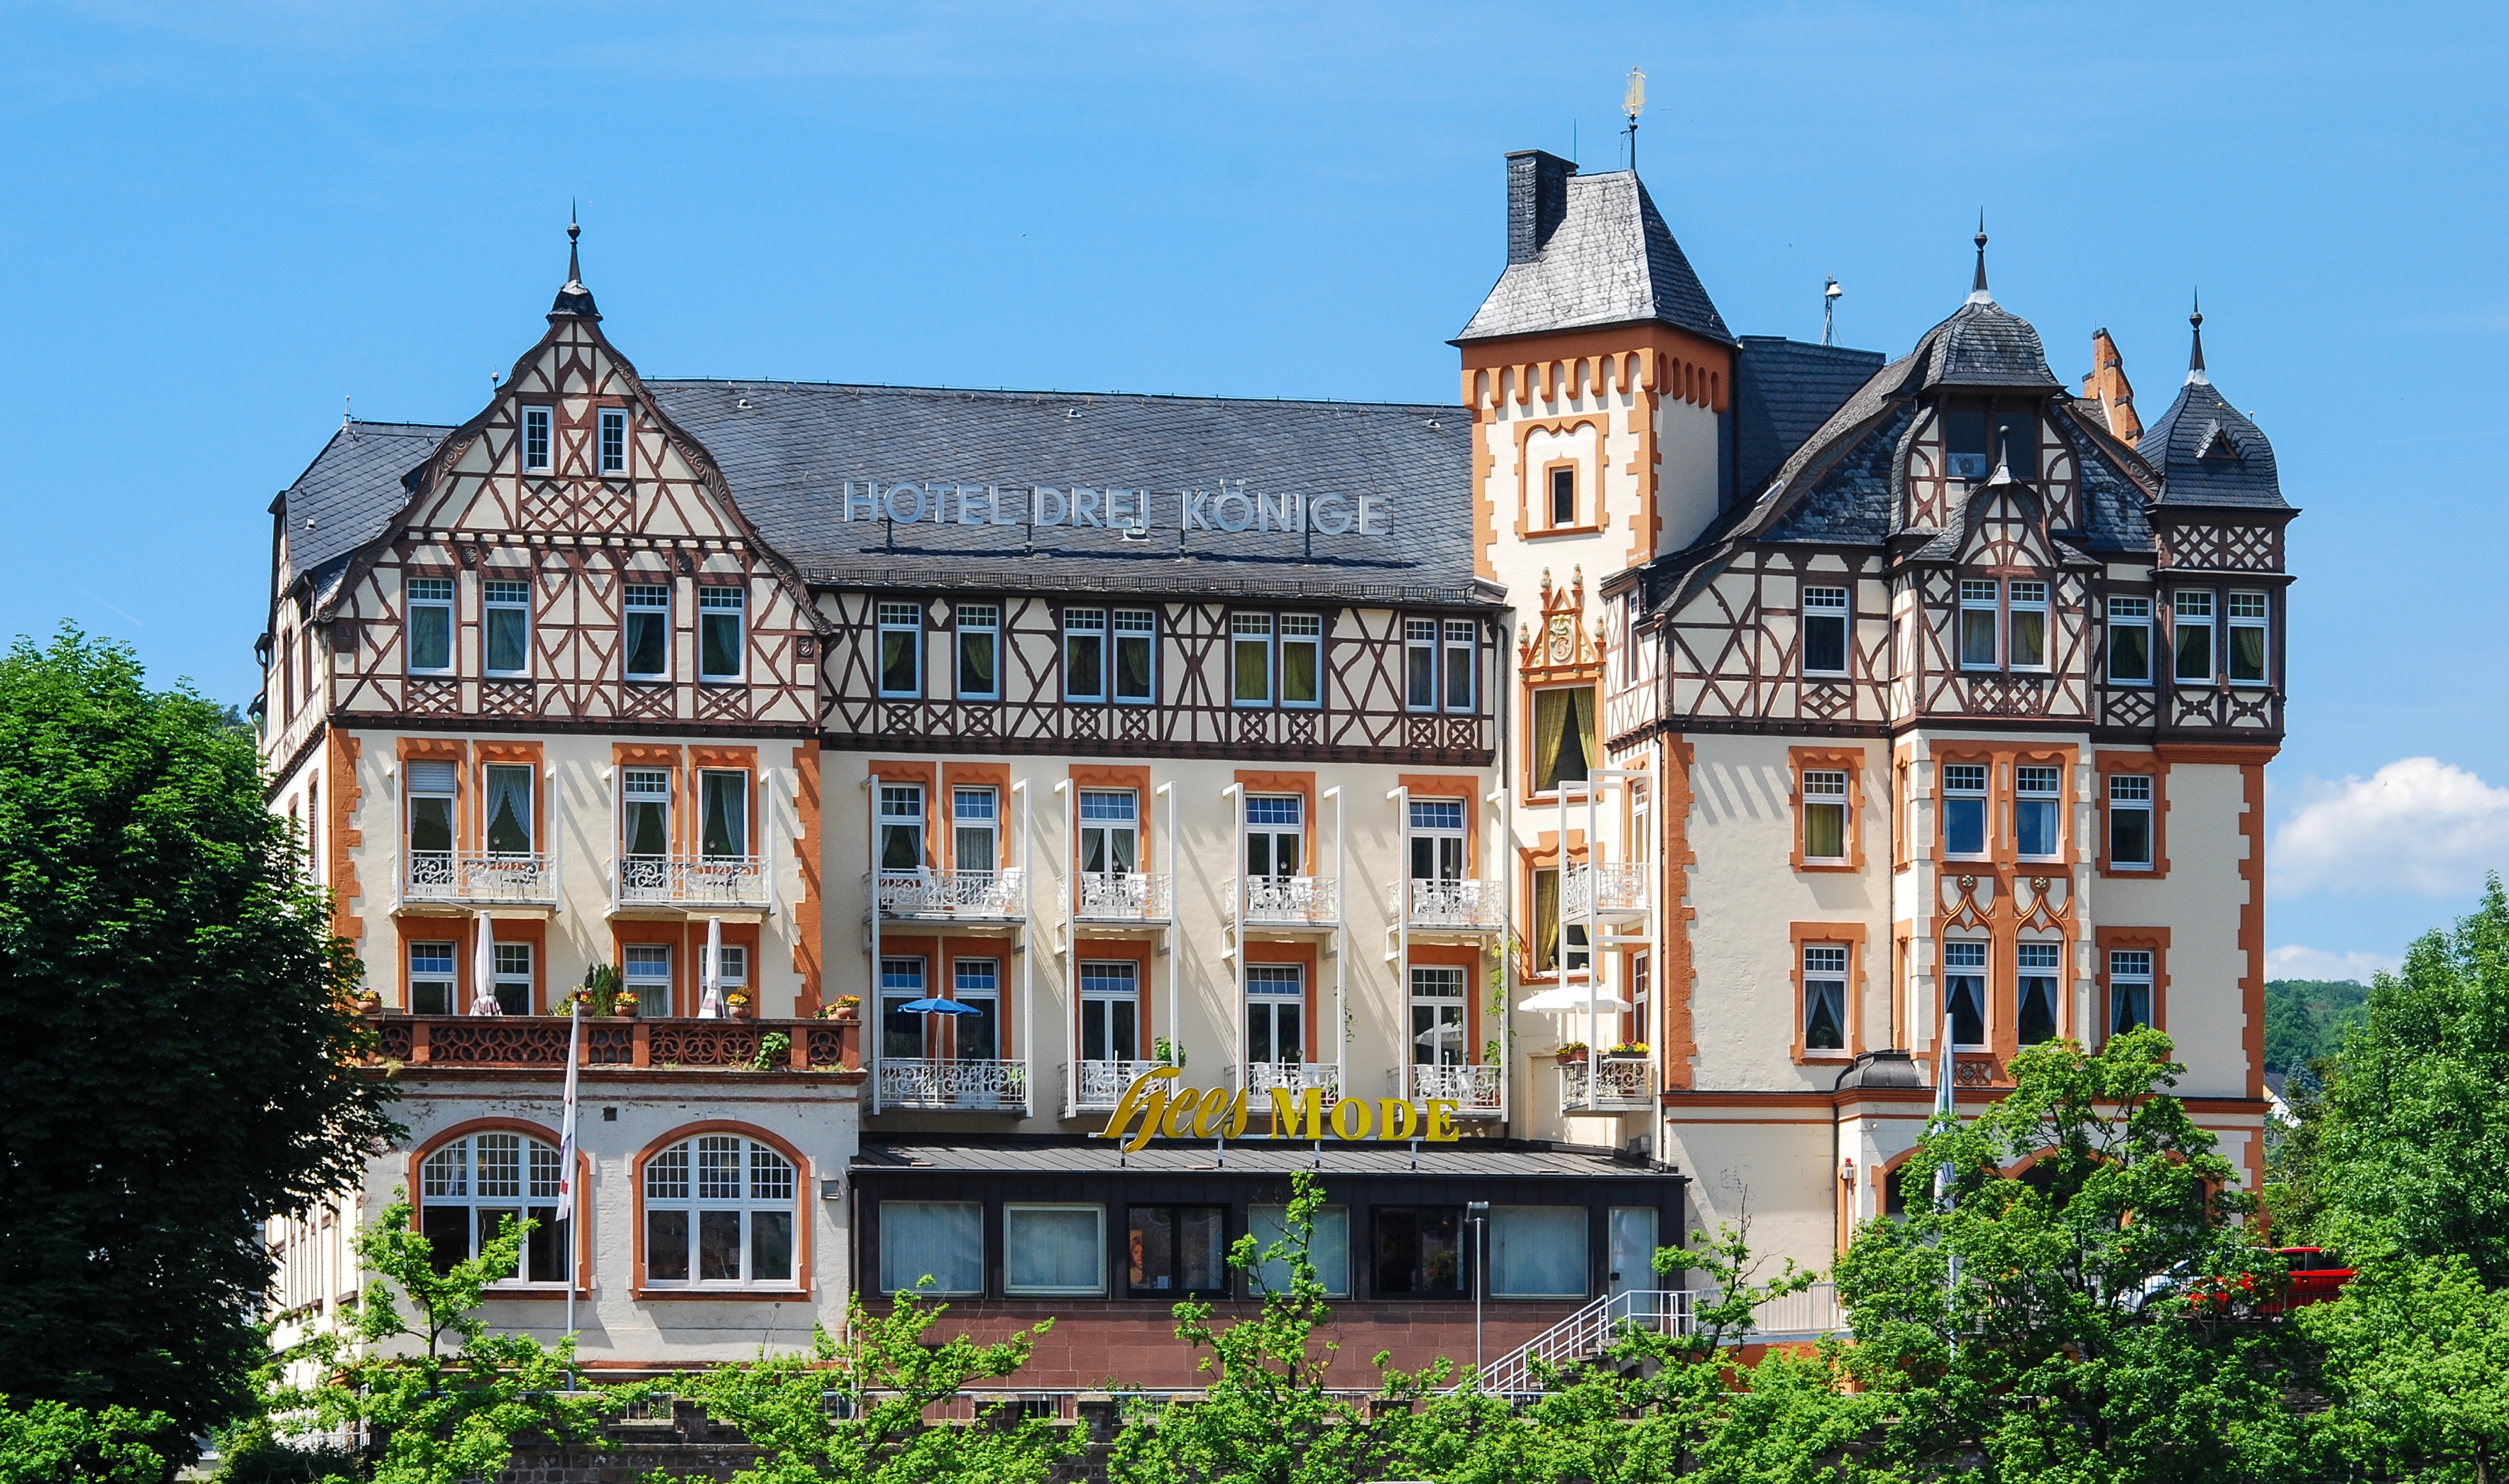 Bernkastel Kues Hotel Wellneb